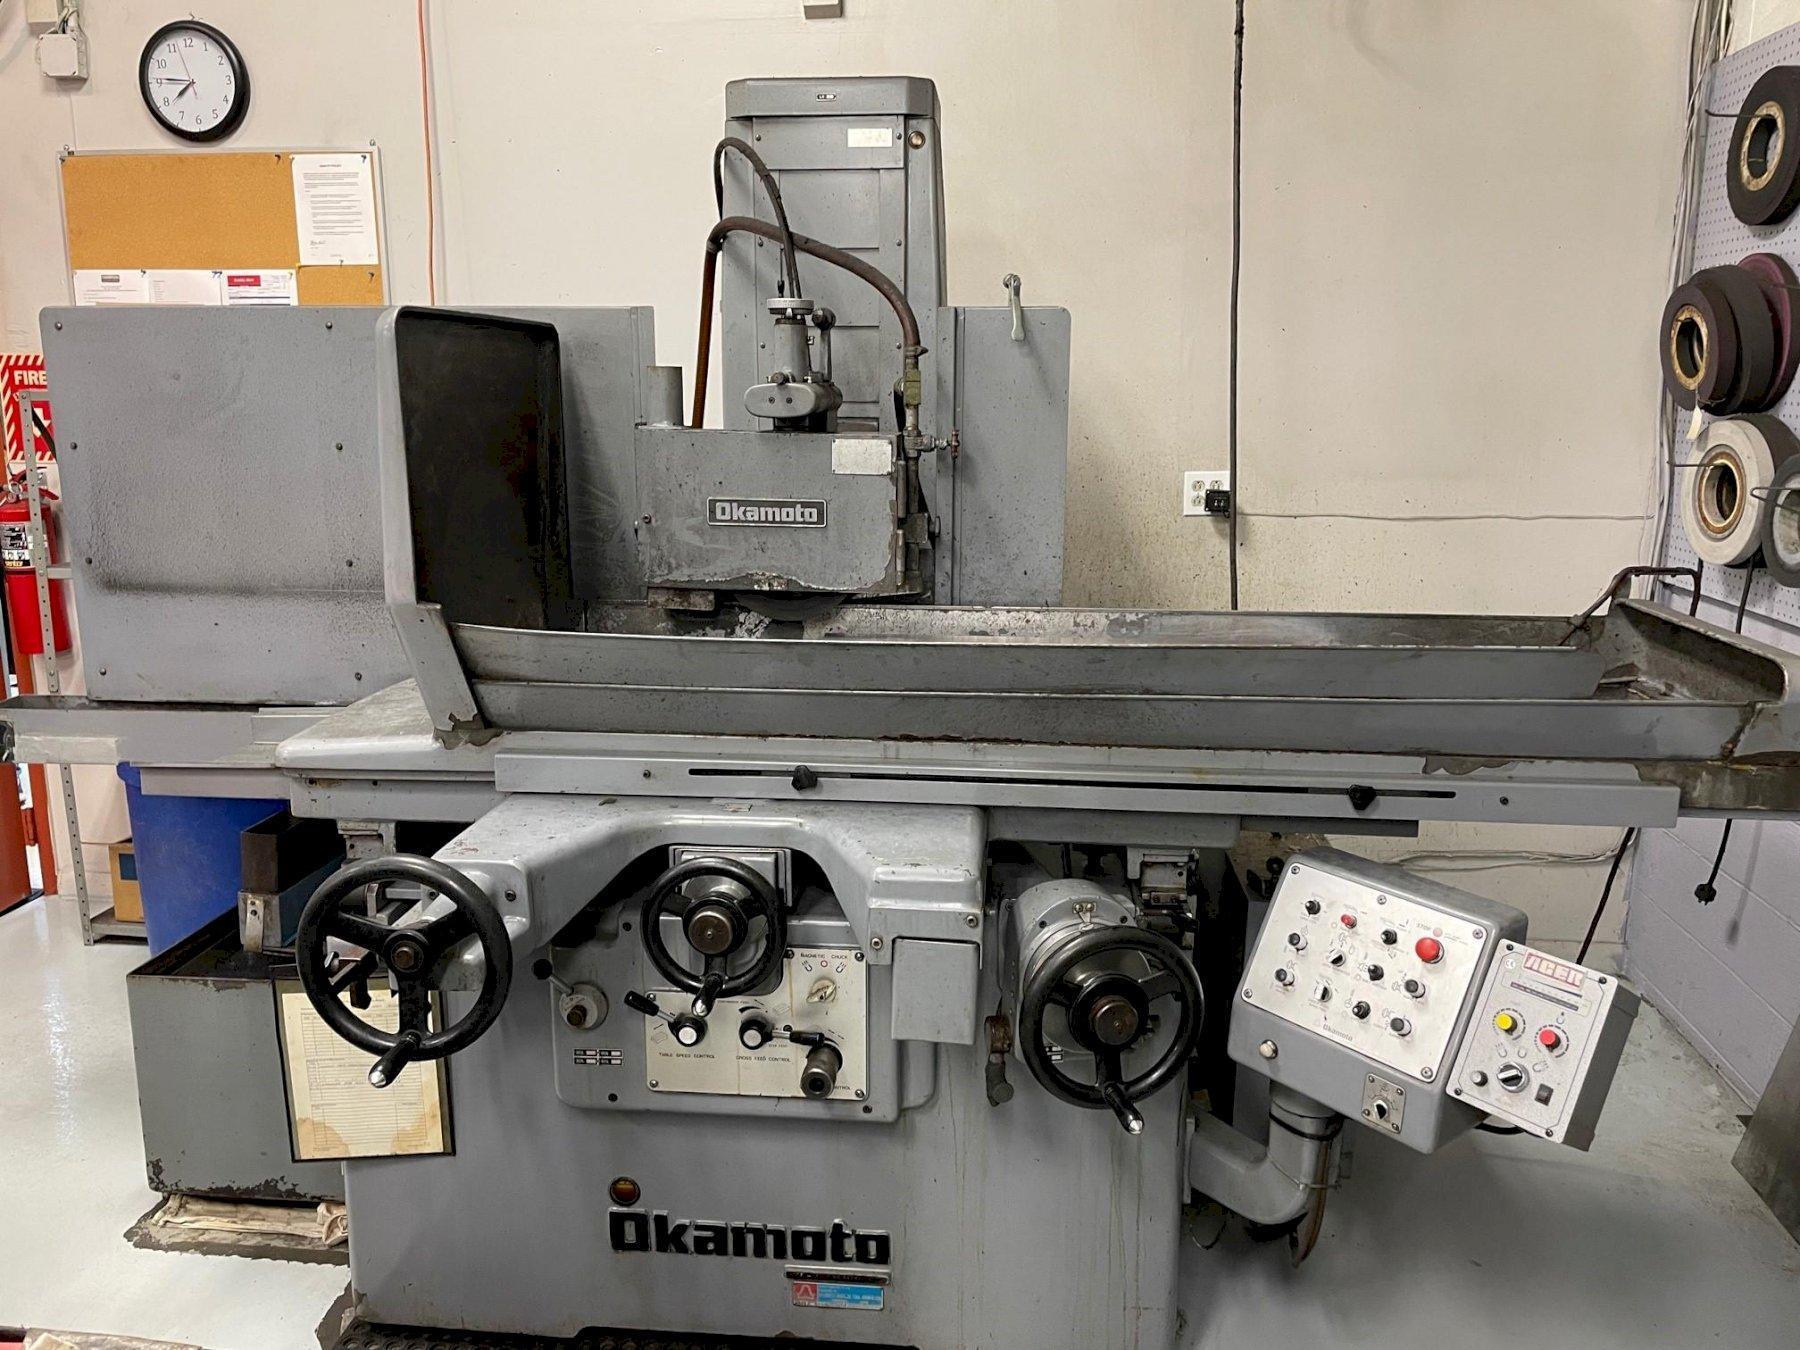 "Okamoto 1632N Hyrdaulic Surface Grinder, 16""x32"" Chuck, 12"" Wheel, Incr. Downfeed, Hyd. Over the Wheel Dresser, Sparkout, Coolant w/Filtration, 1985"